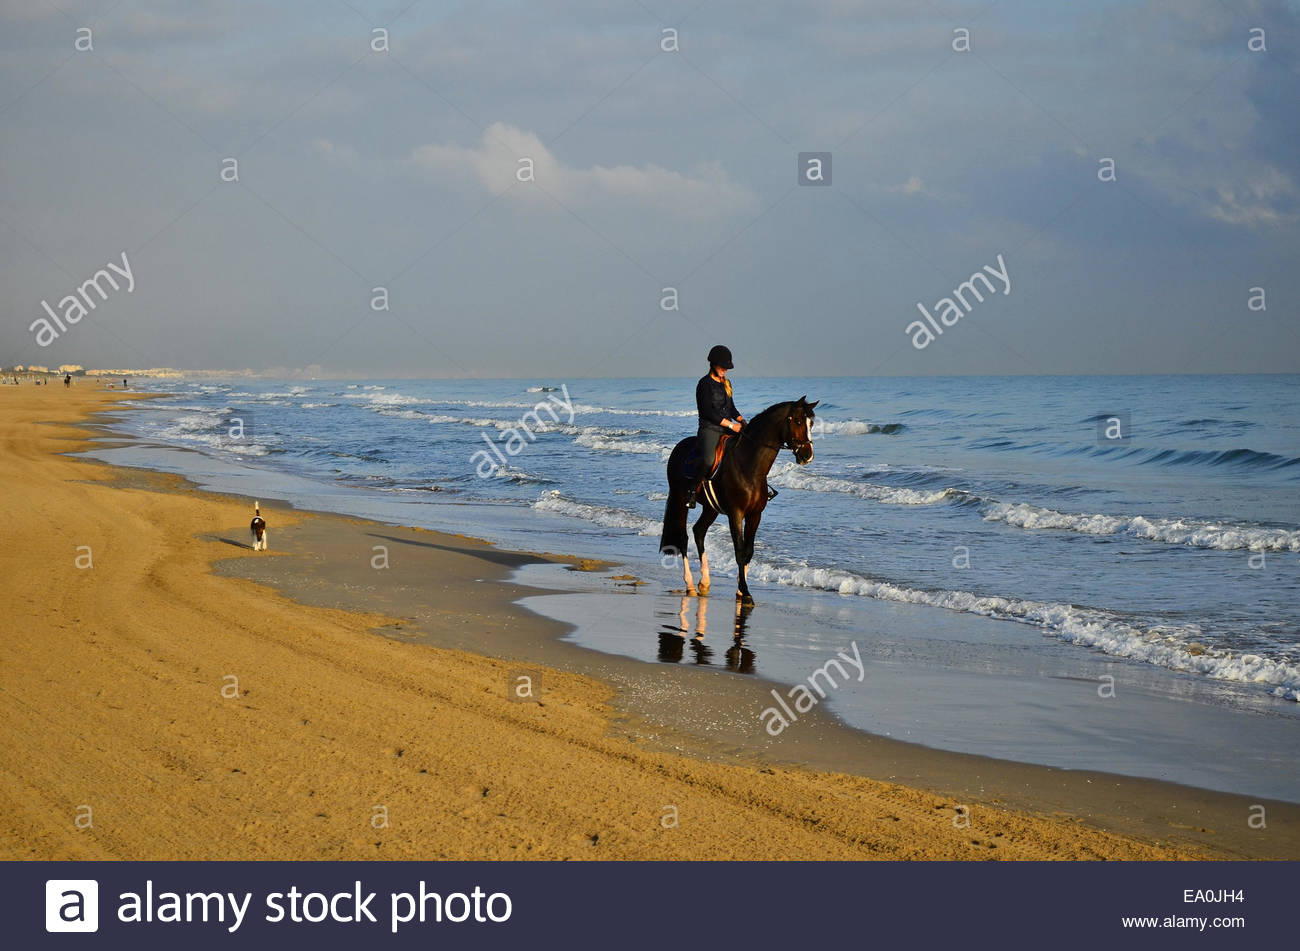 Joven Jinete playa de Oliva provincia de Valencia España Europa Imagen De Stock